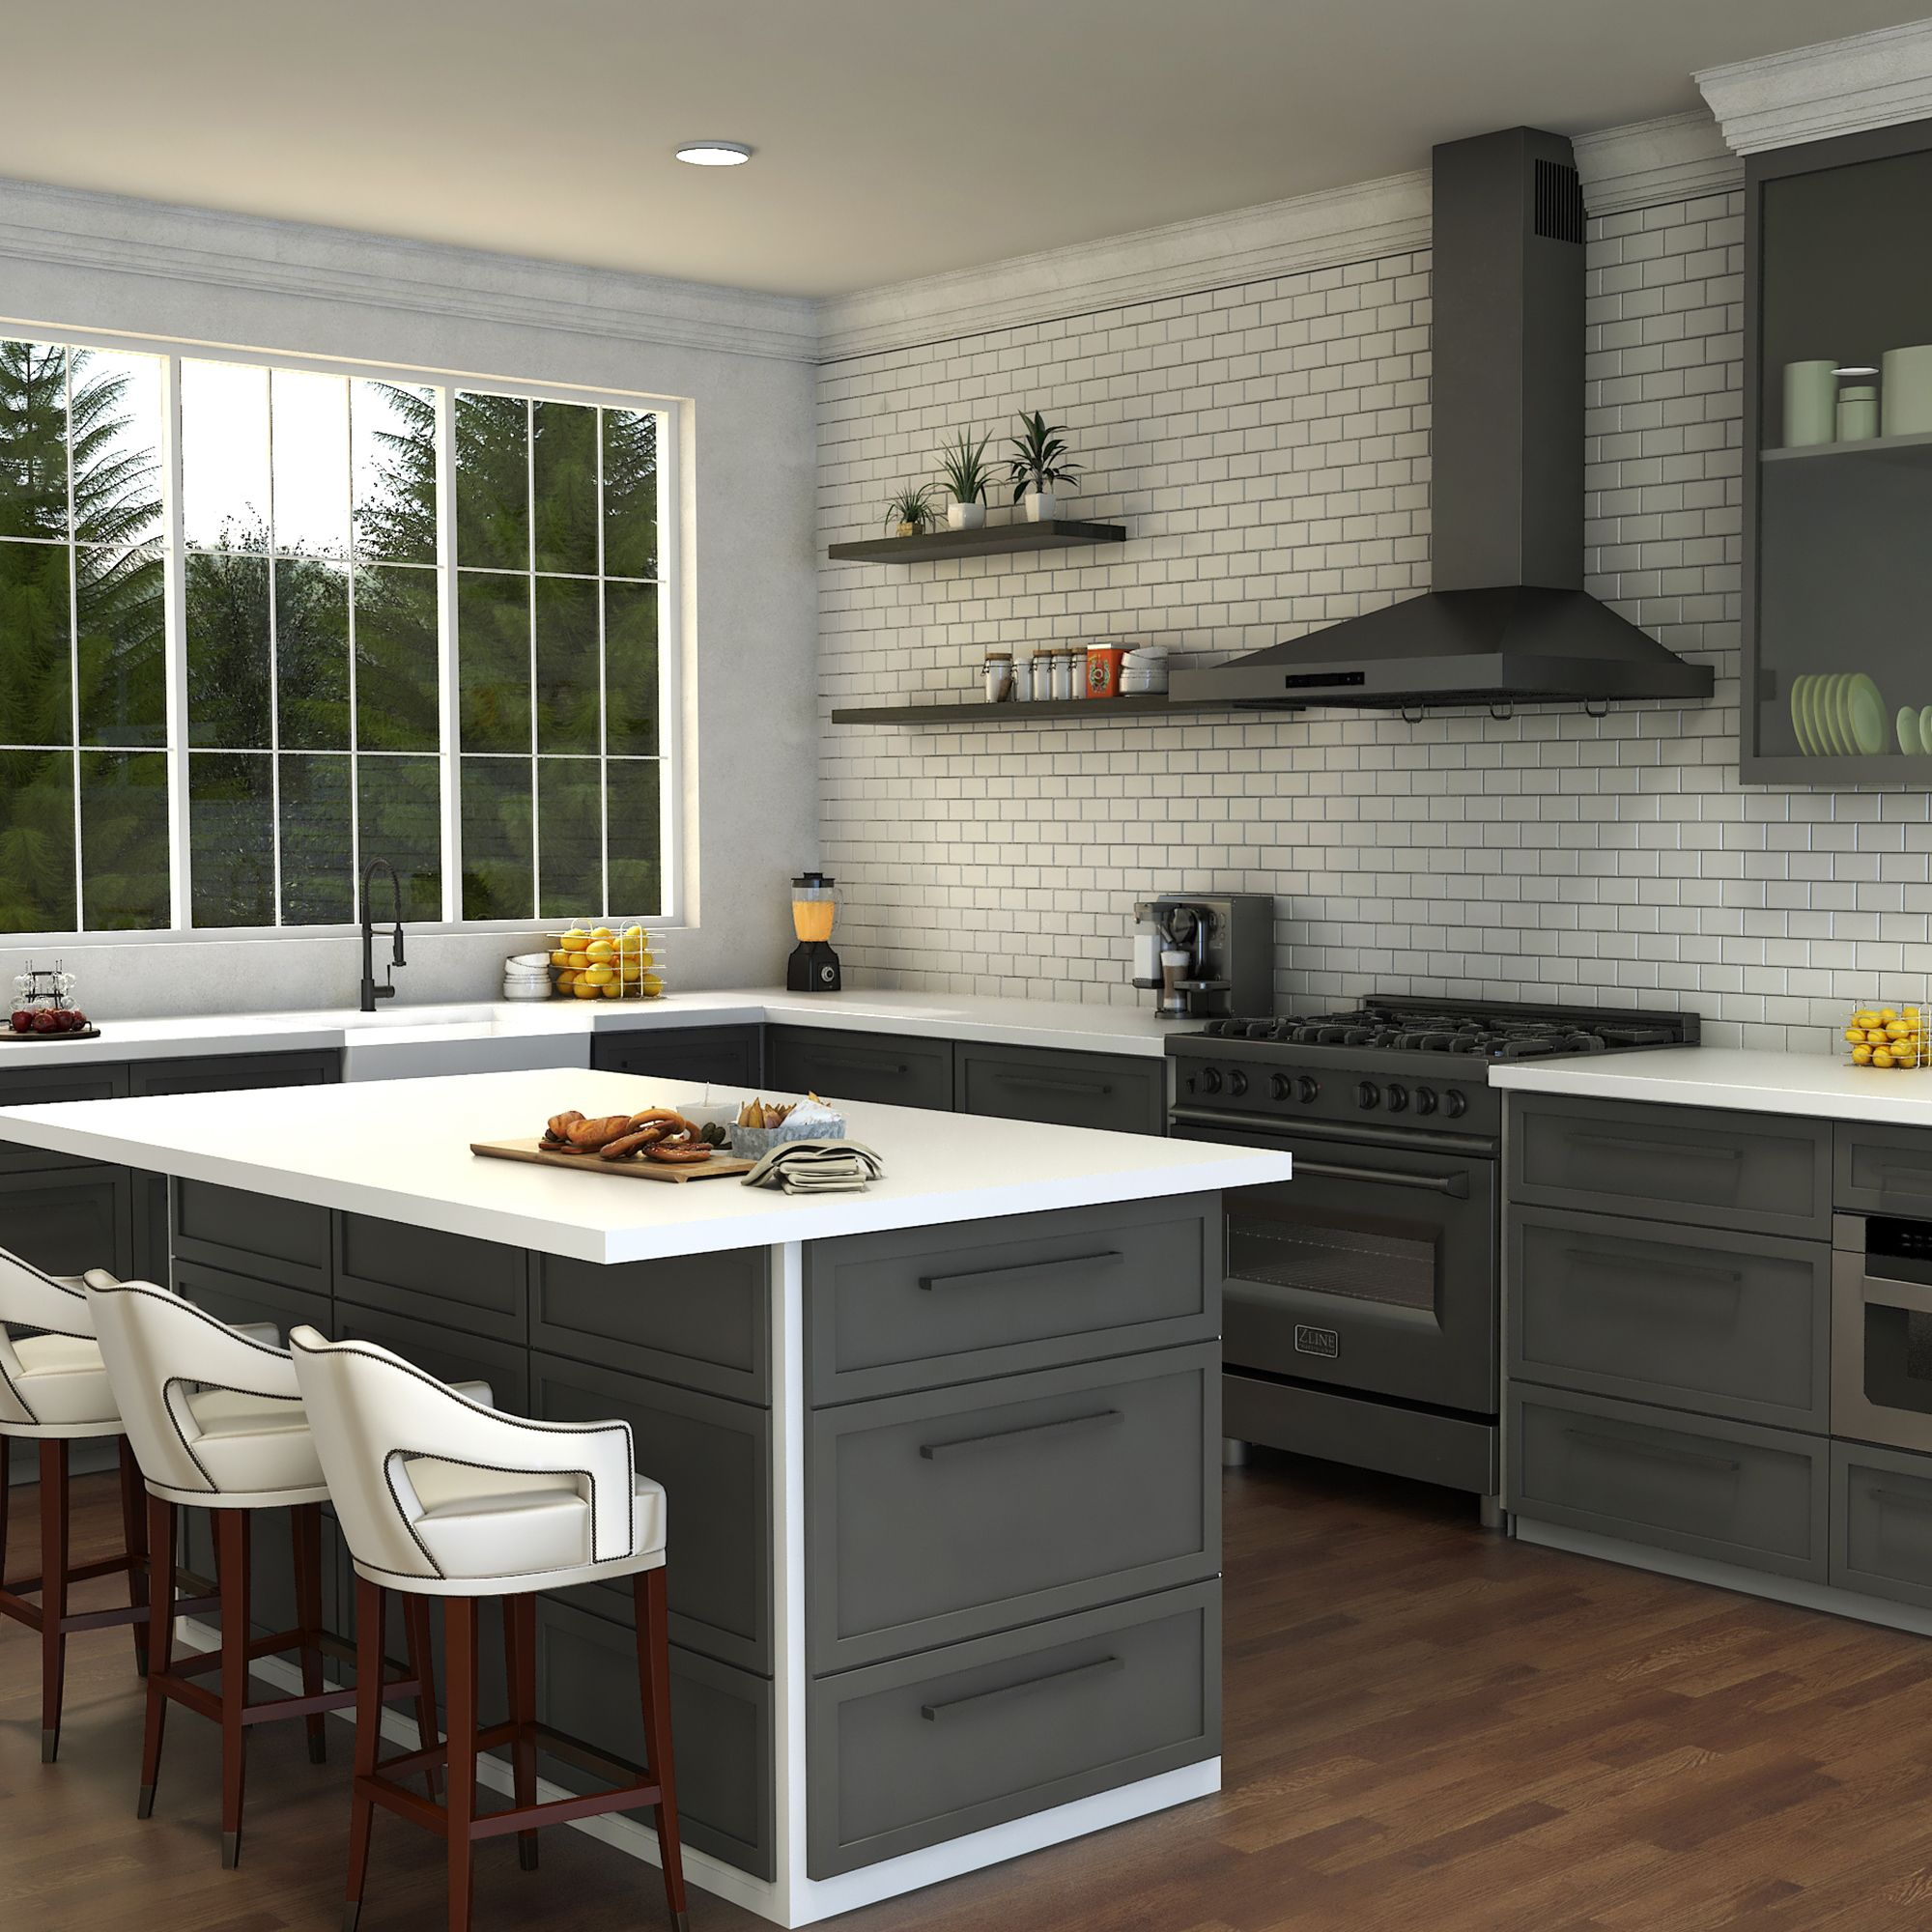 Zline Apollo Kitchen Faucet In Matte Black Apl Kf Mb Kitchen Design Kitchen Style Kitchen Faucet Design